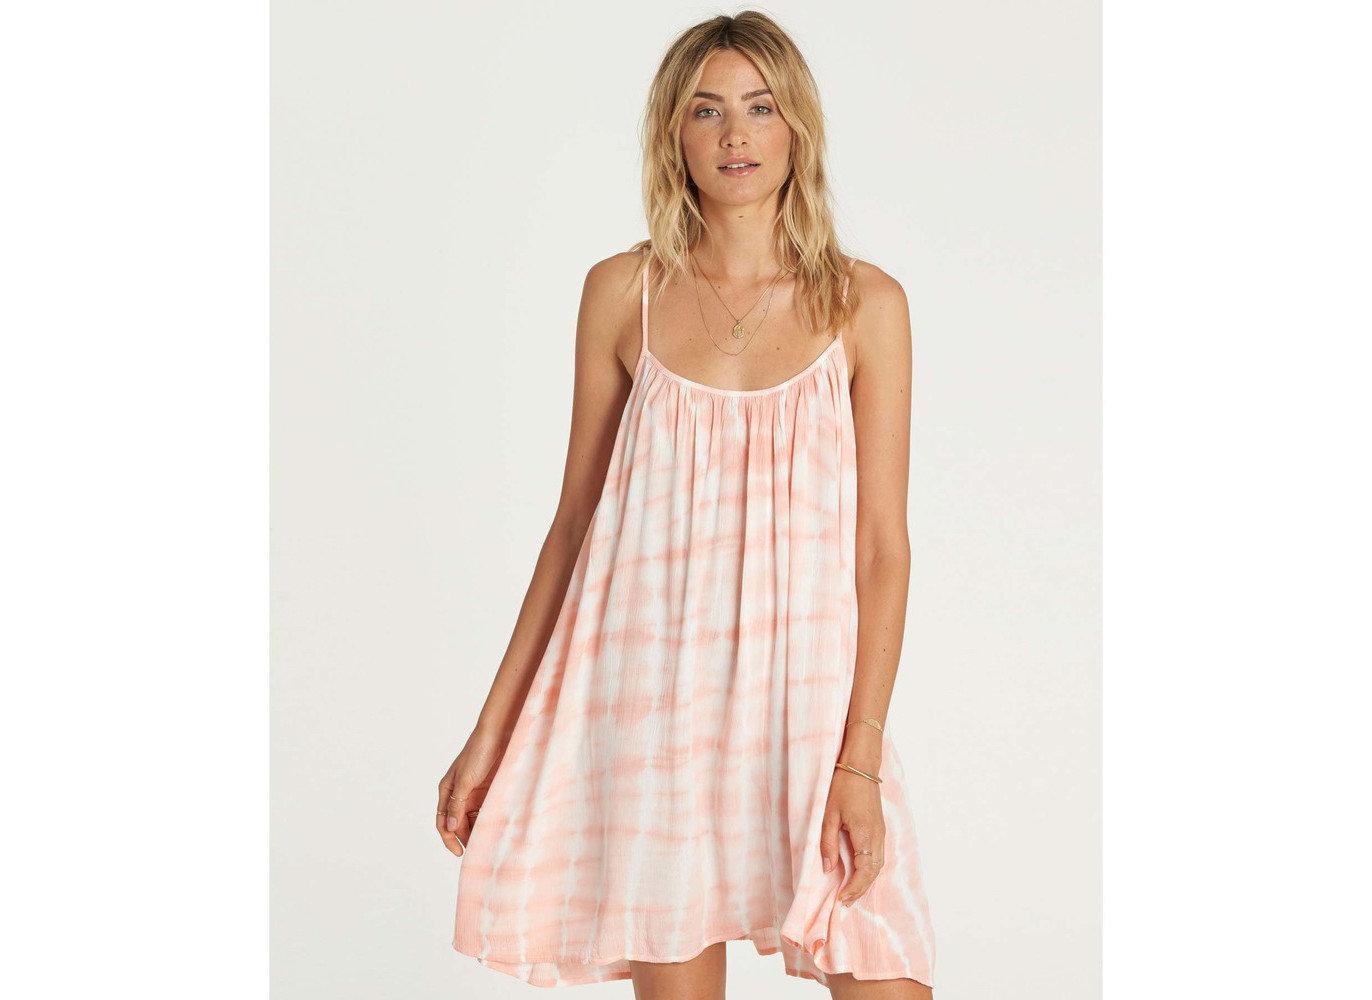 4195c2a363c Style + Design Travel Shop clothing person day dress fashion model woman  dress nightwear shoulder supermodel